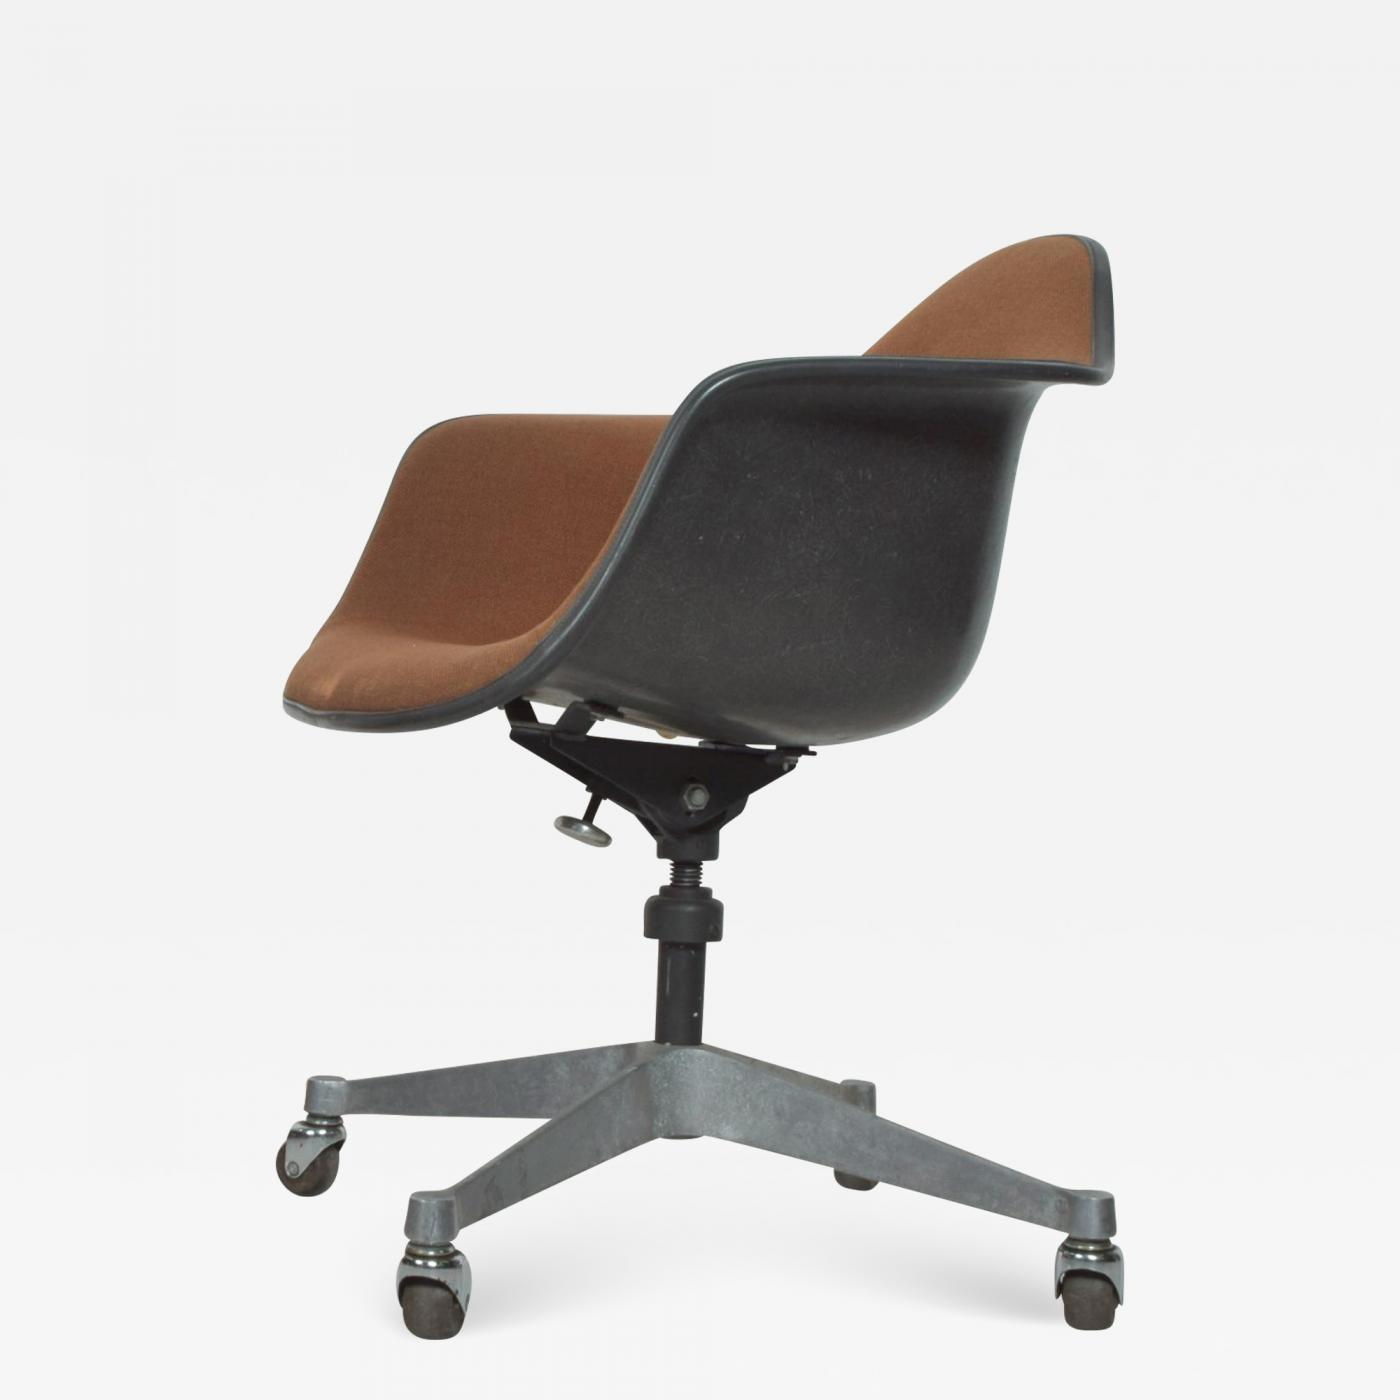 Herman Miller Herman Miller Eames Bucket Office Chair With Casters Mid Century Modern